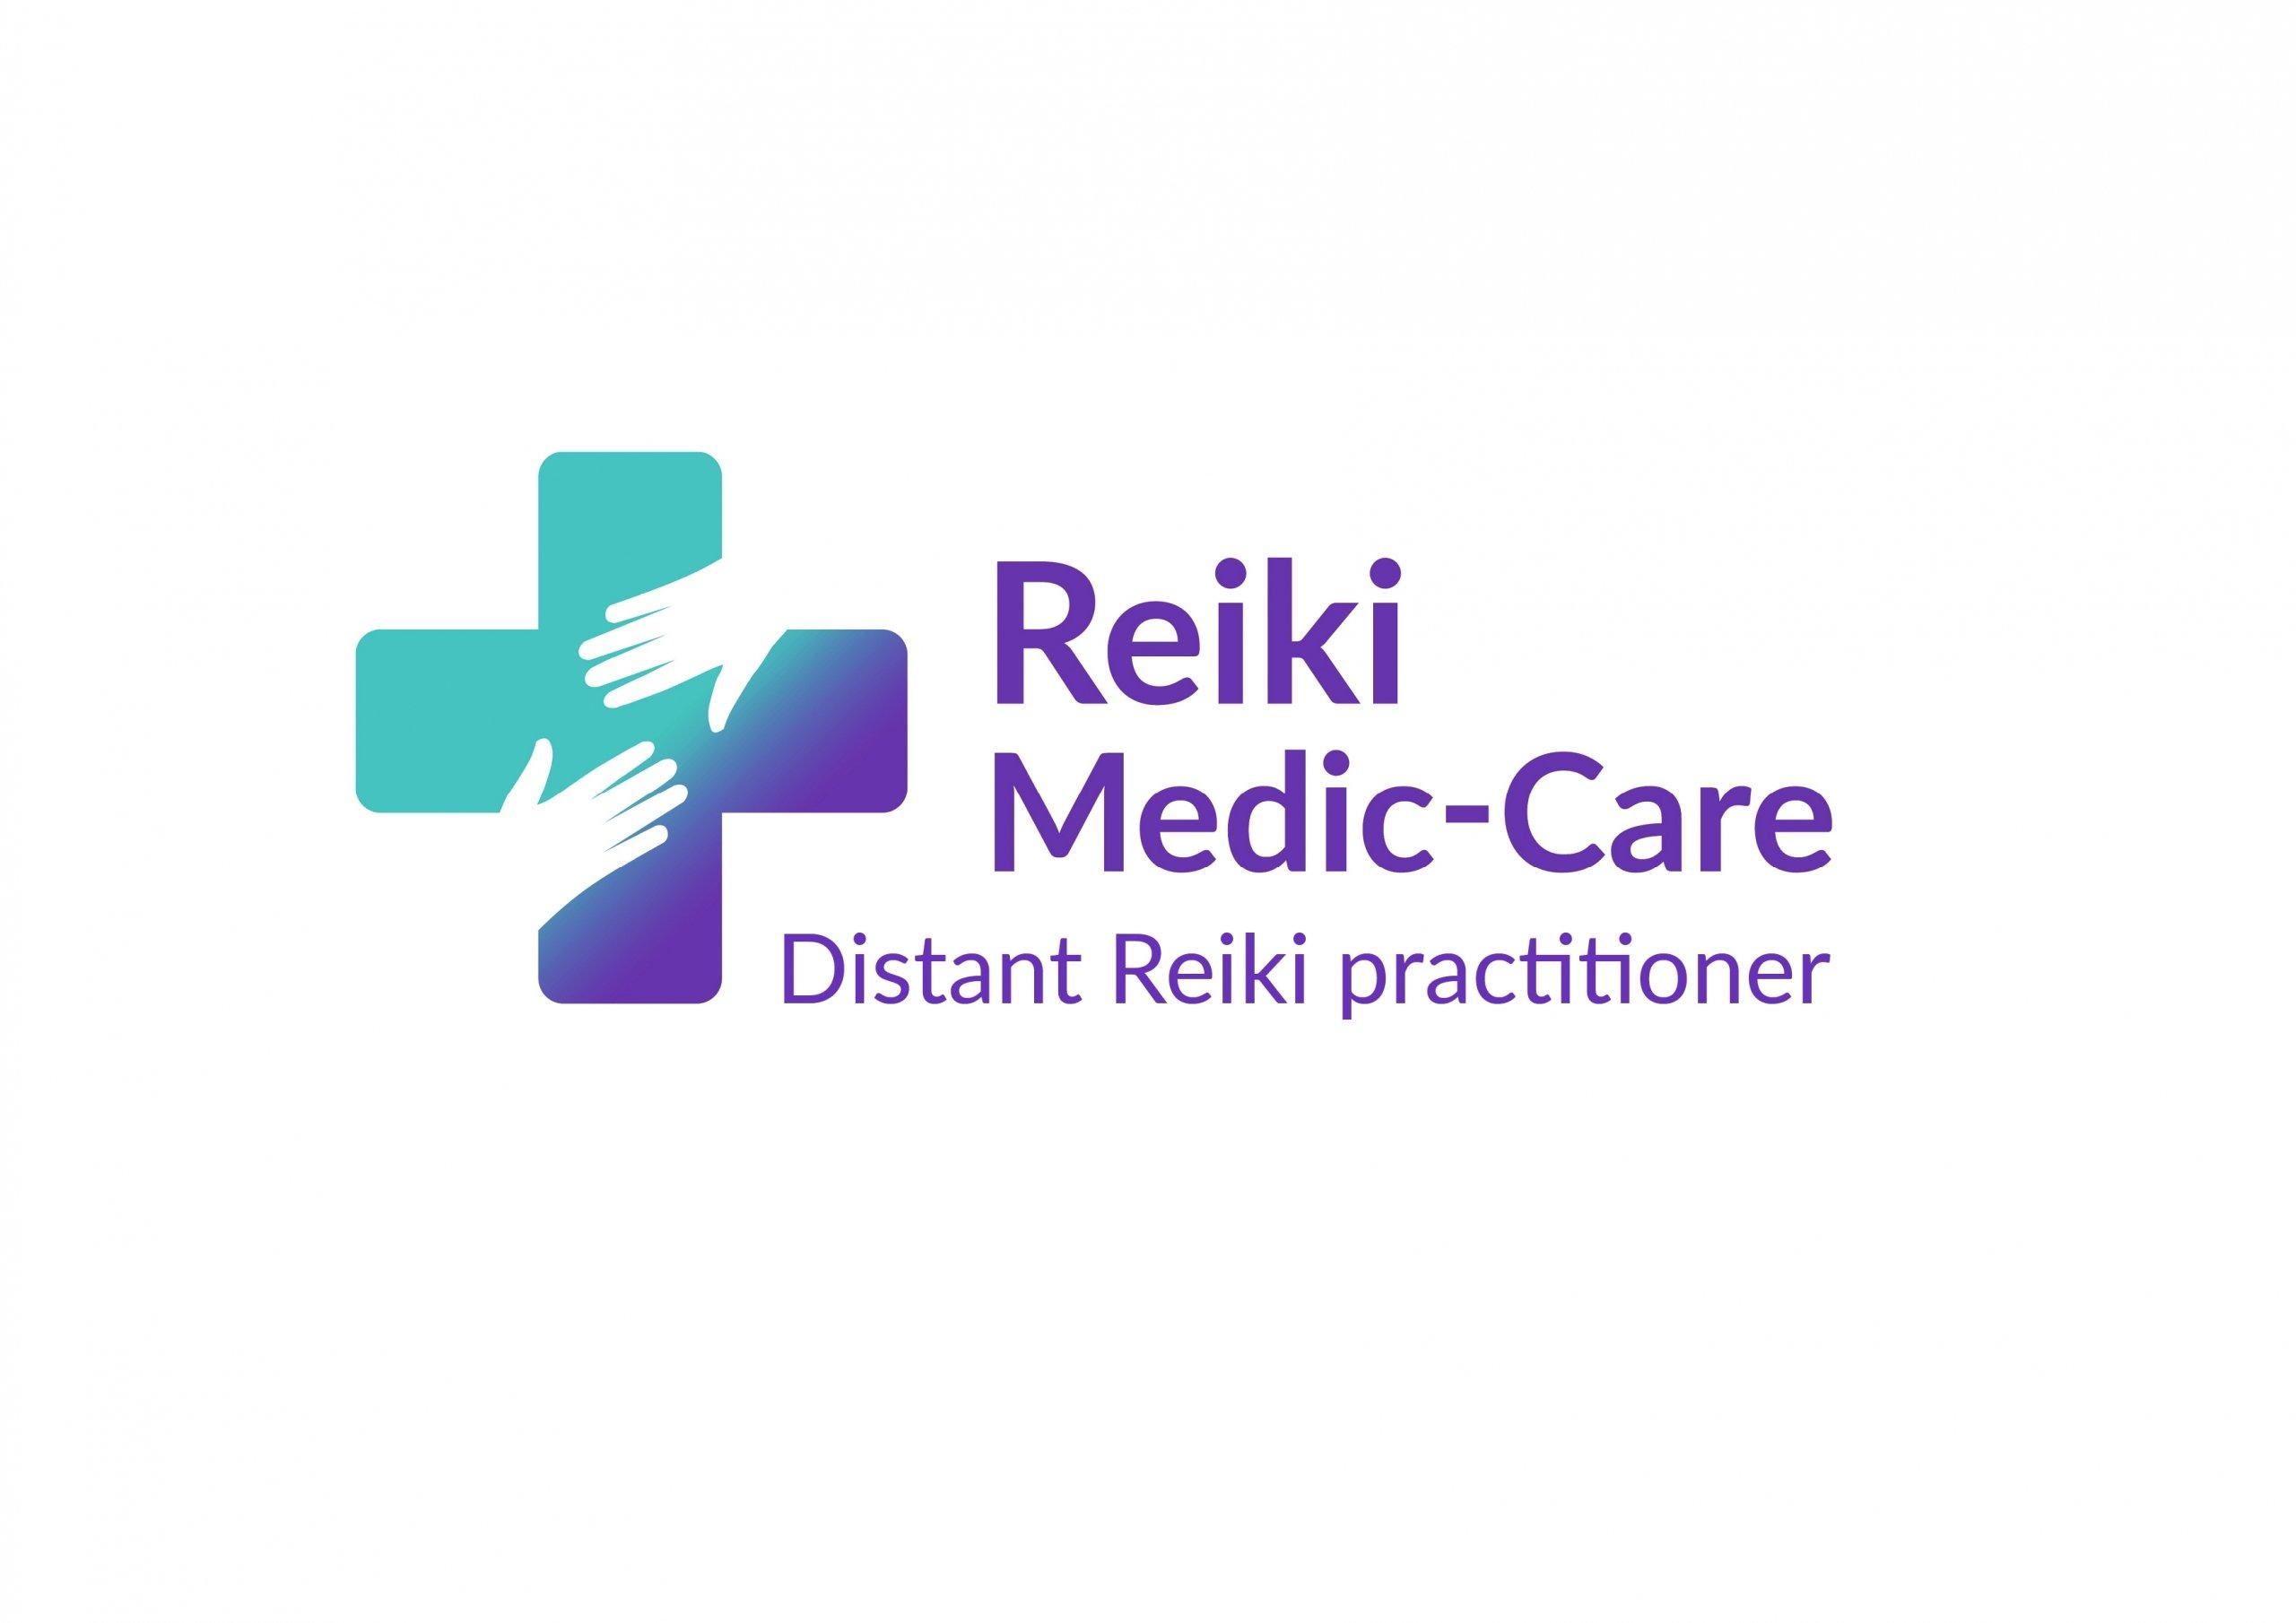 image-Uk Reiki Medic-care